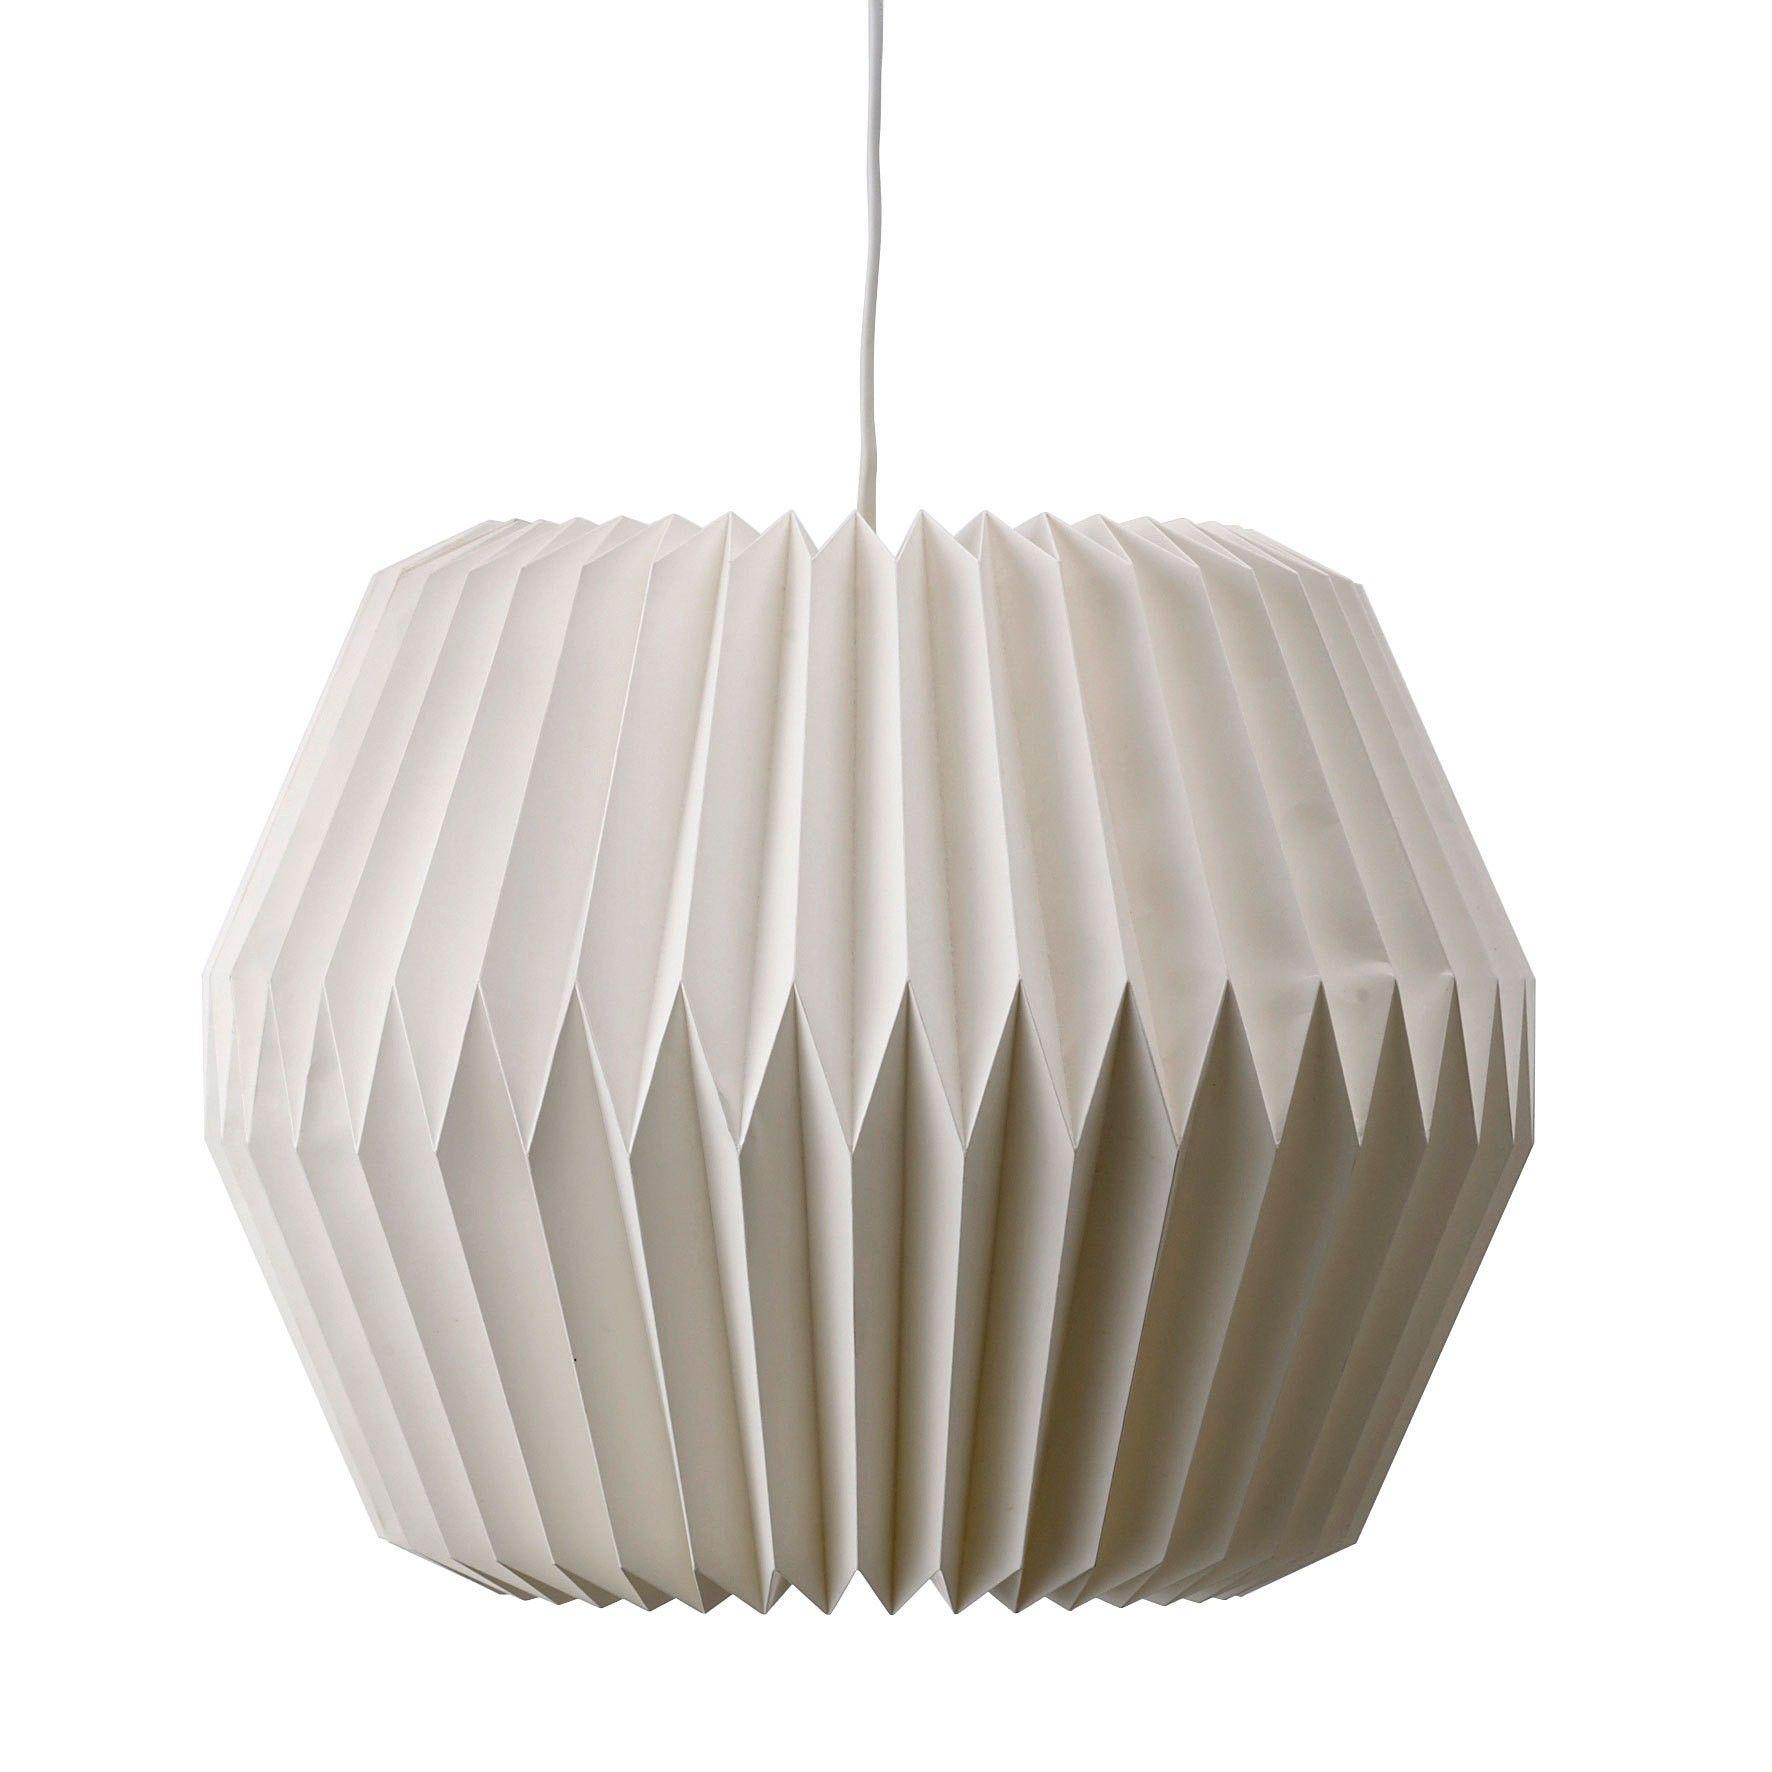 Bloomingville Lampe White Paper 1 Papierlampen Lampe Weiss Papierlampenschirm